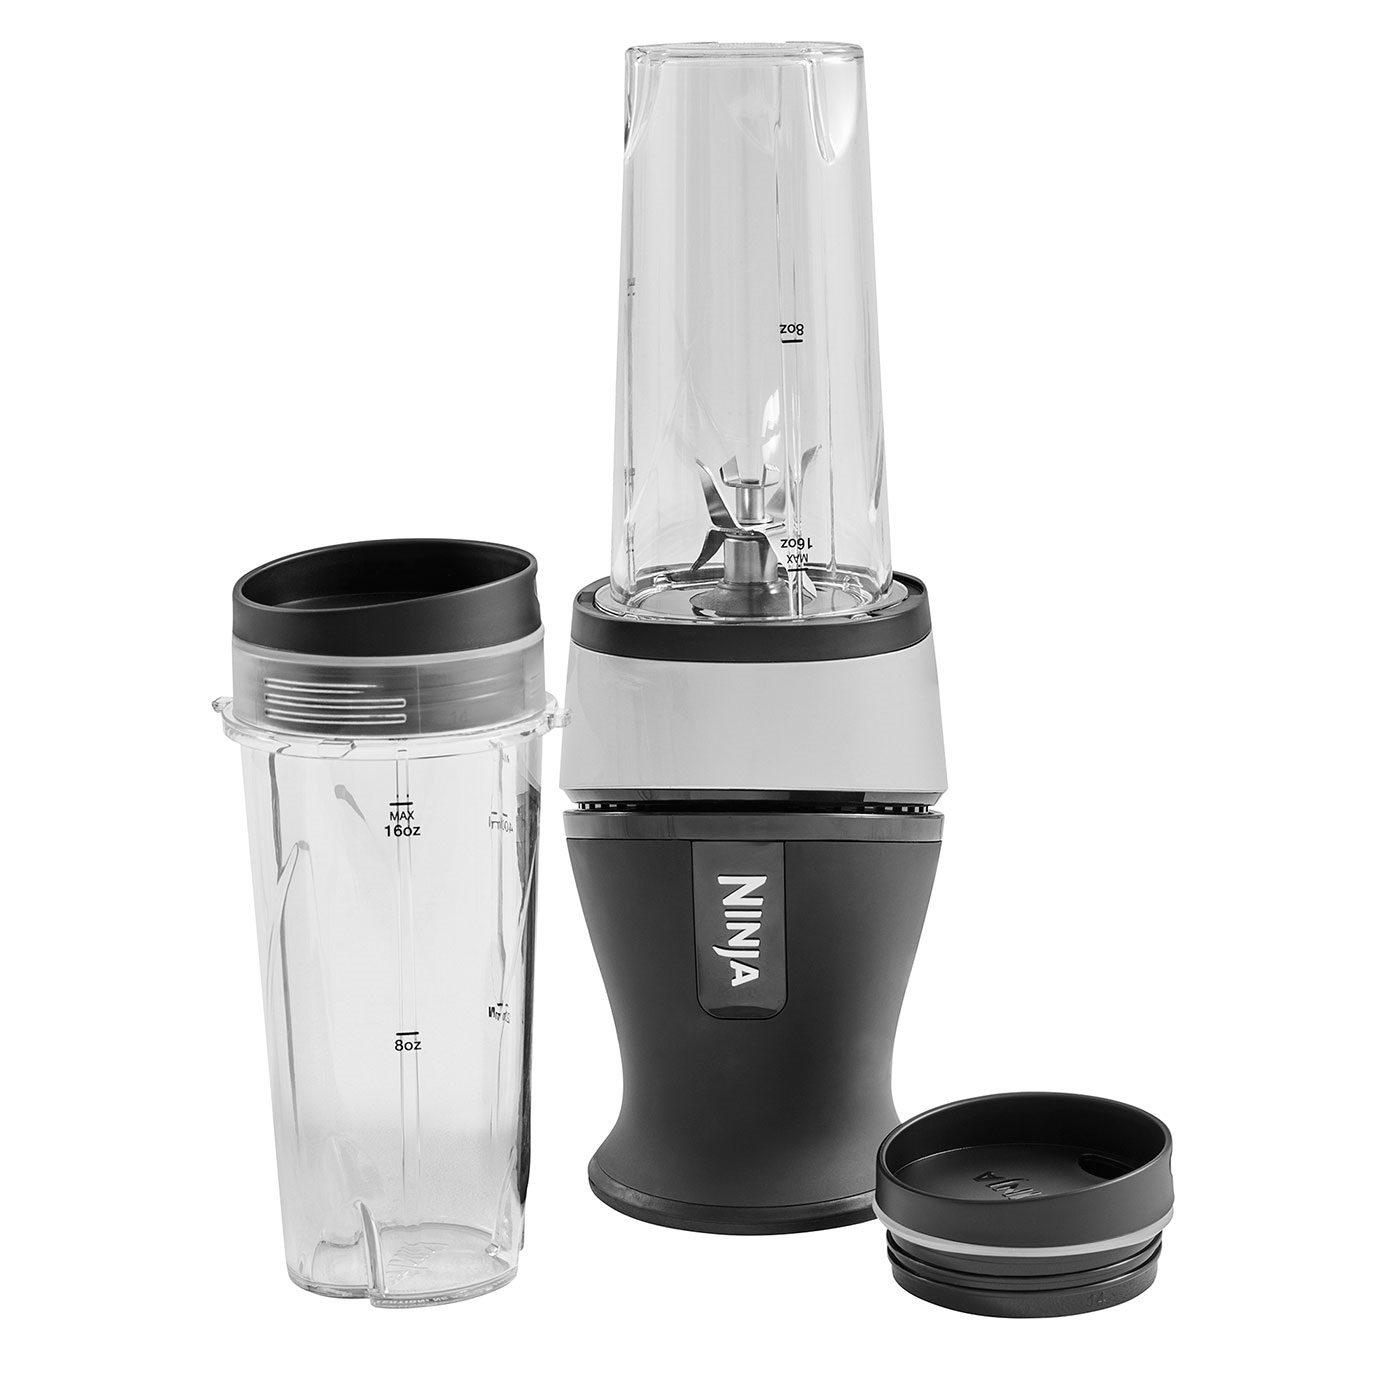 Nutri Ninja QB3001UK 700W Blender - Silver